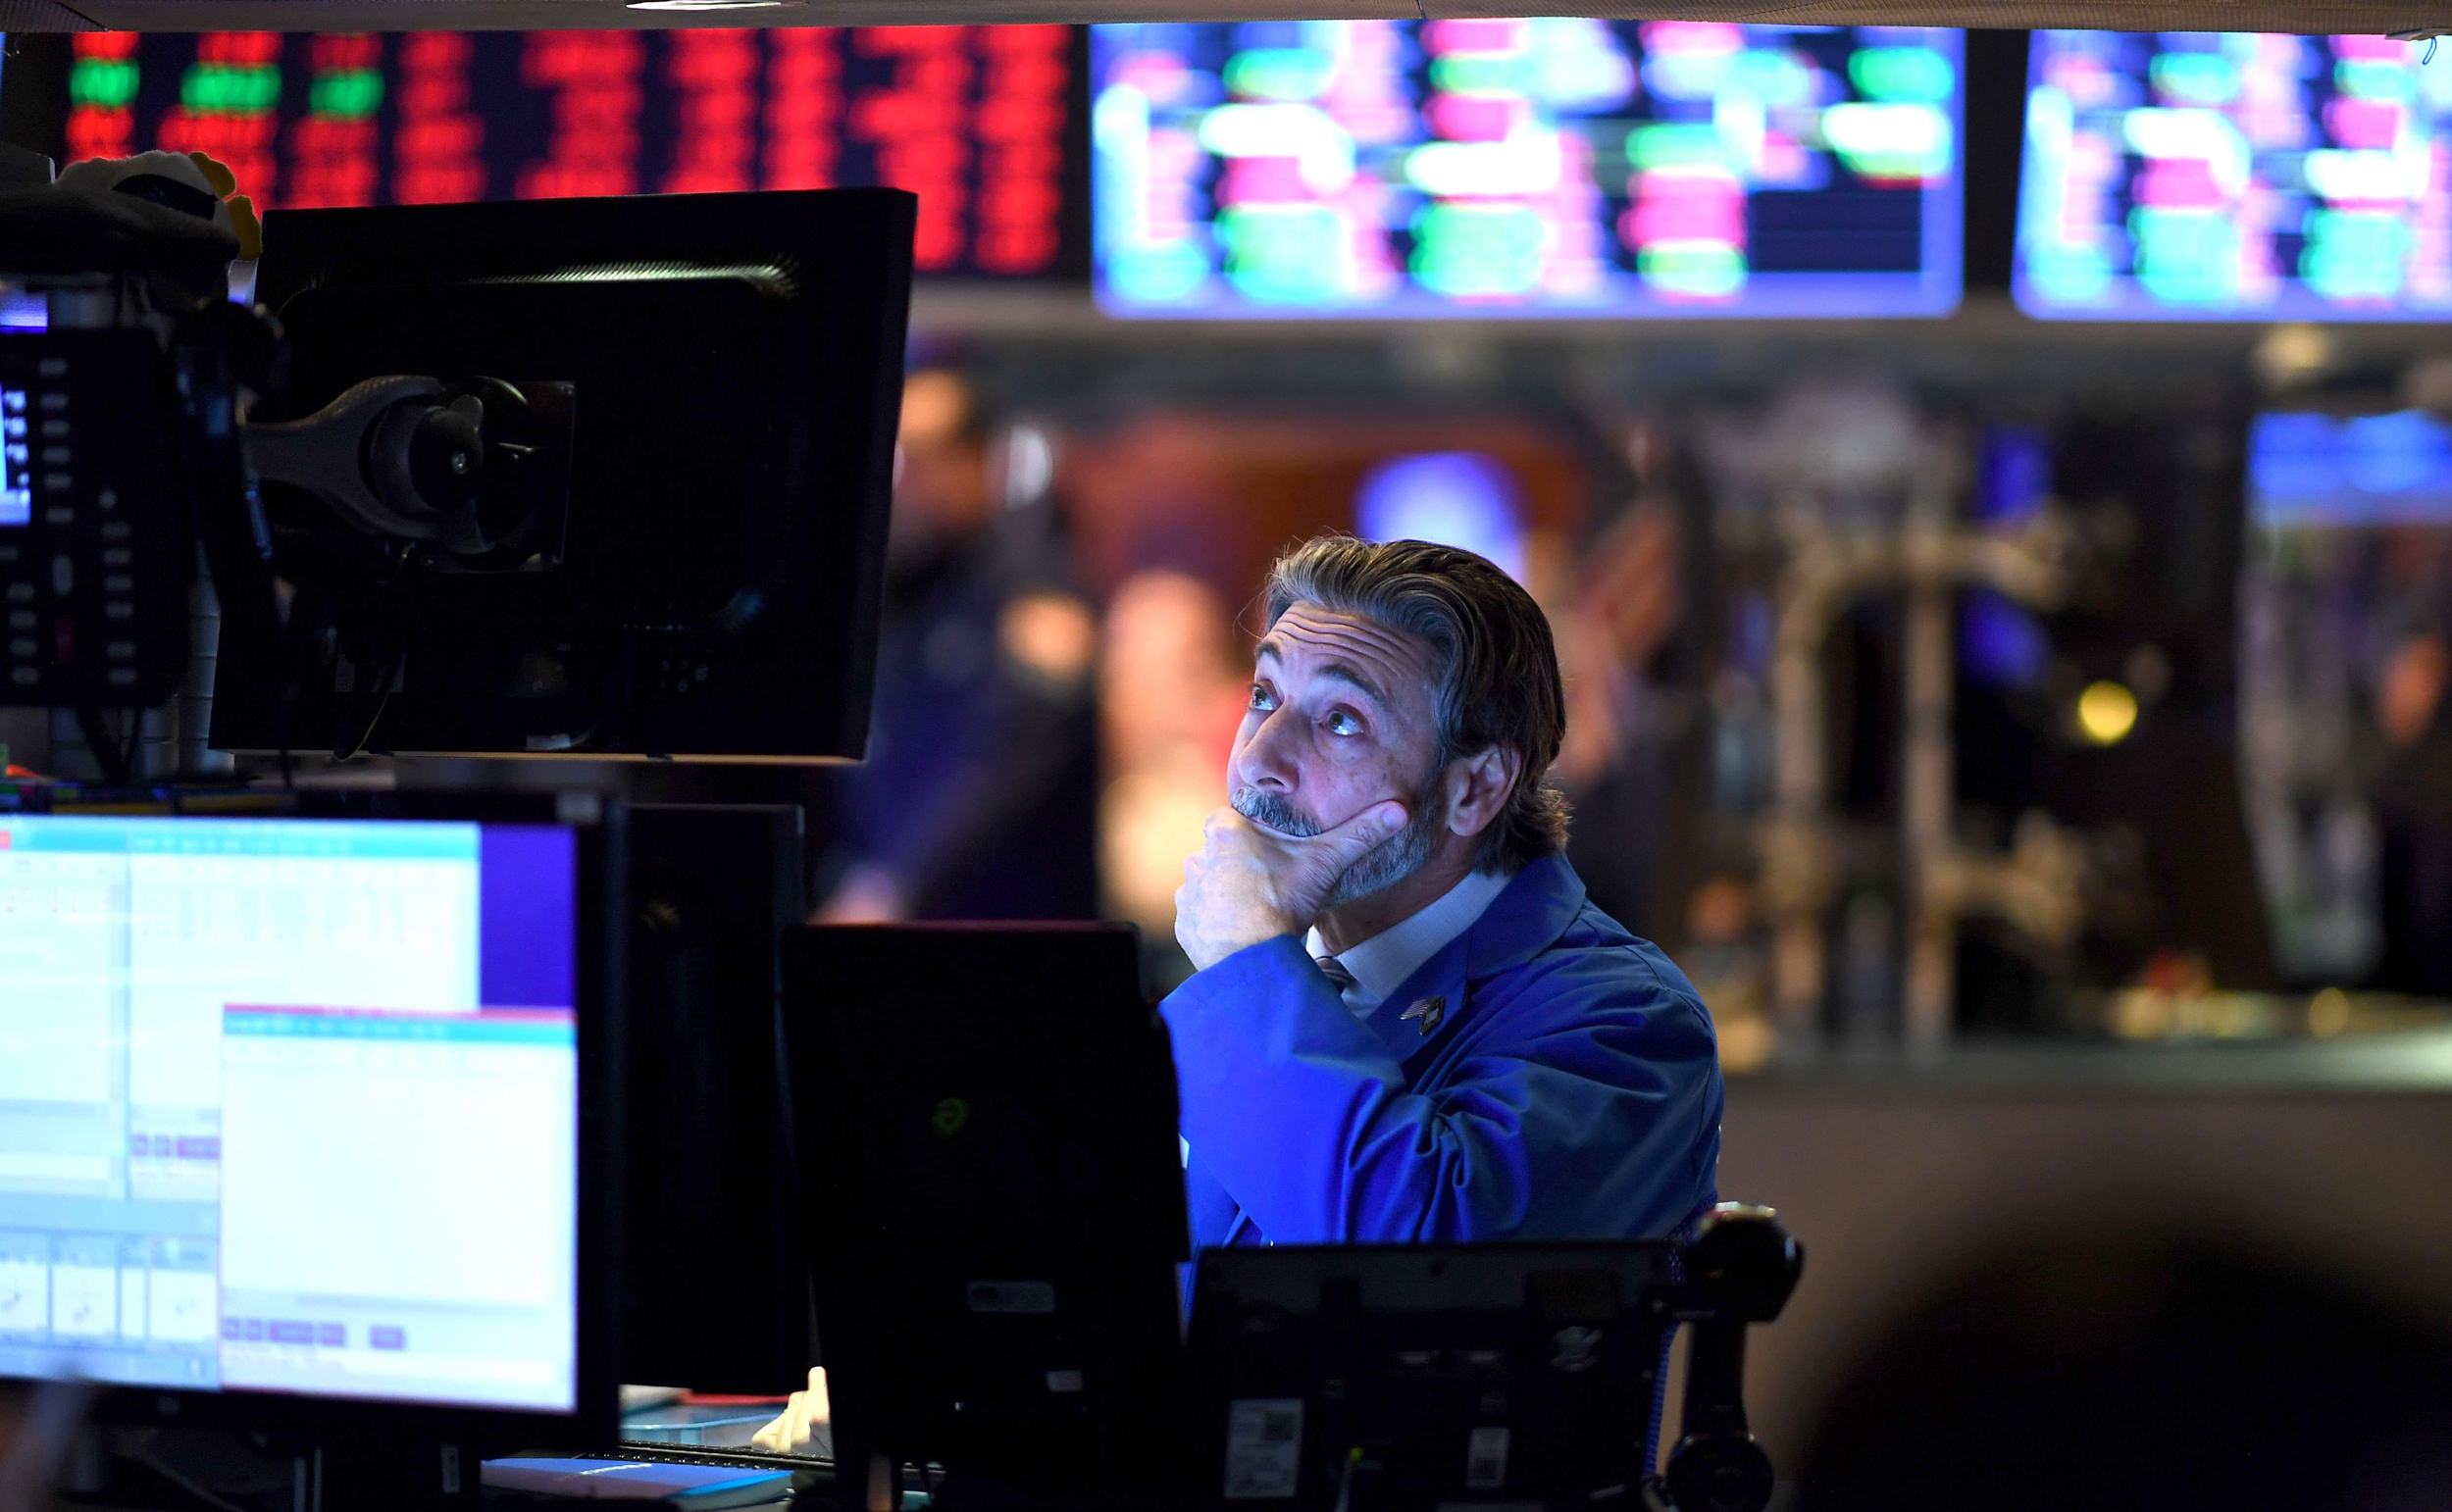 3 Antisipasi Corona yang belum tepat dapat berujung fatal pada ekonomi